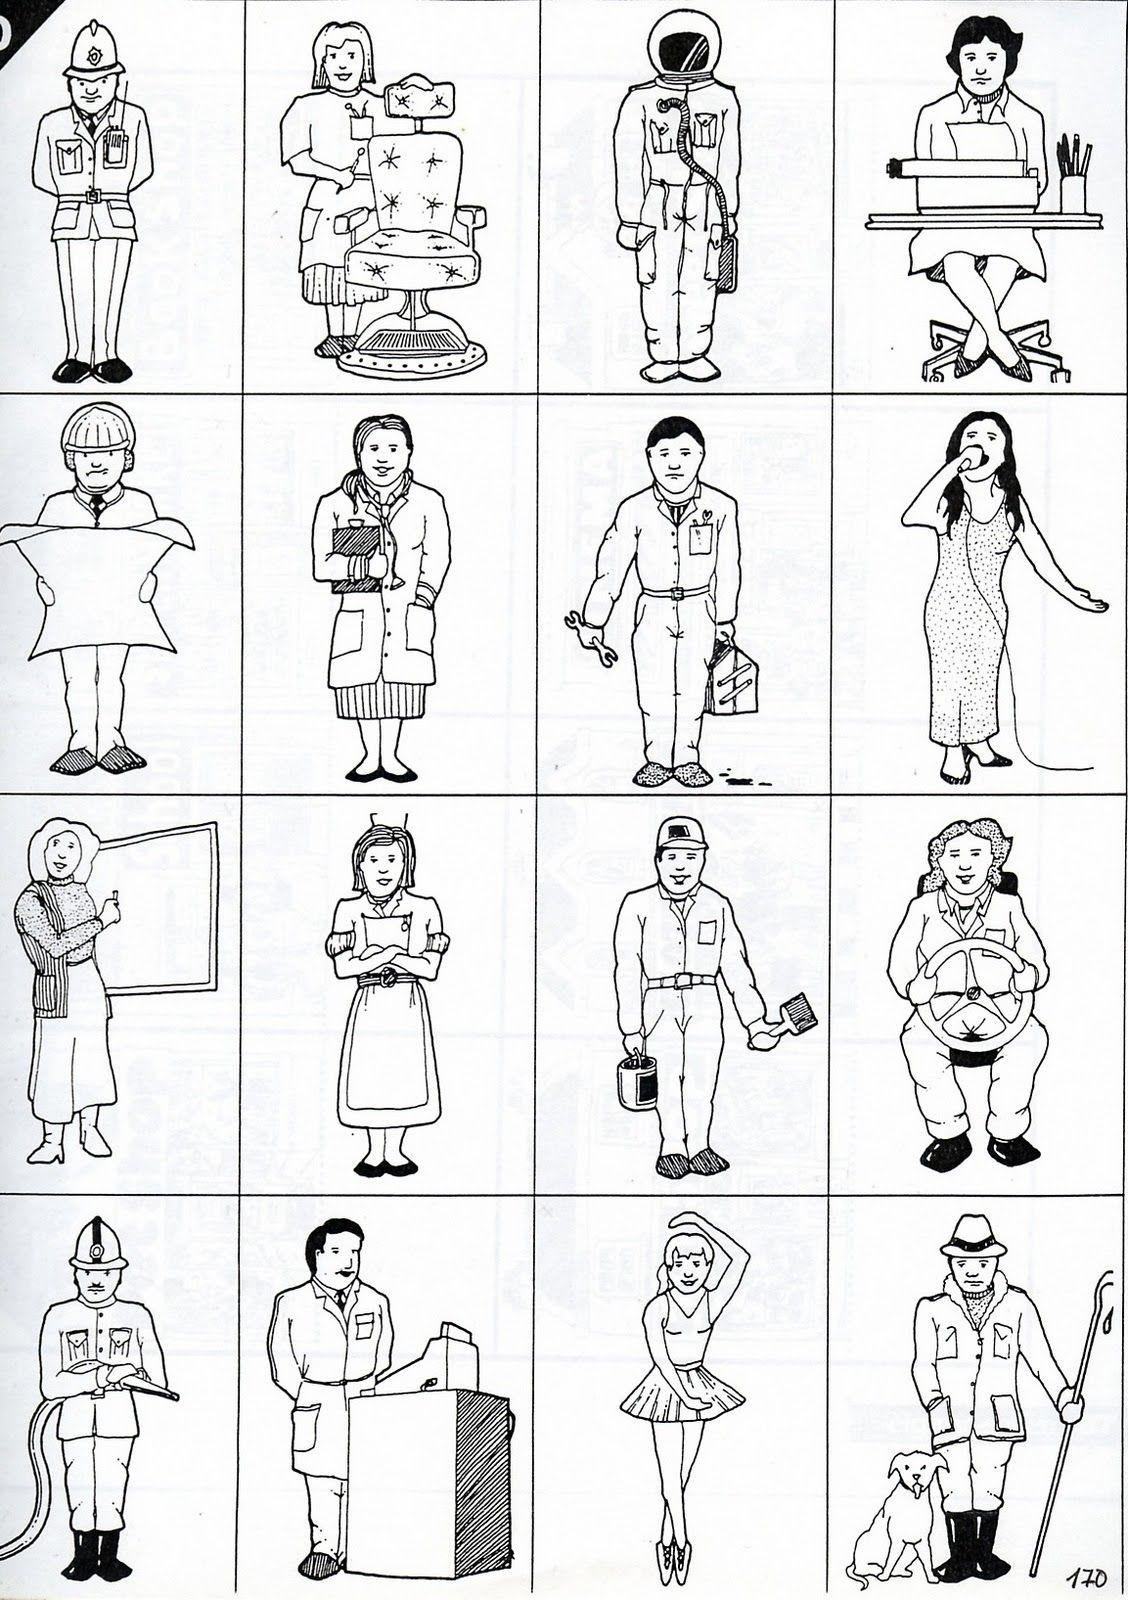 Profesiones para colorear en ingles - Imagui | Ideas for the House ...